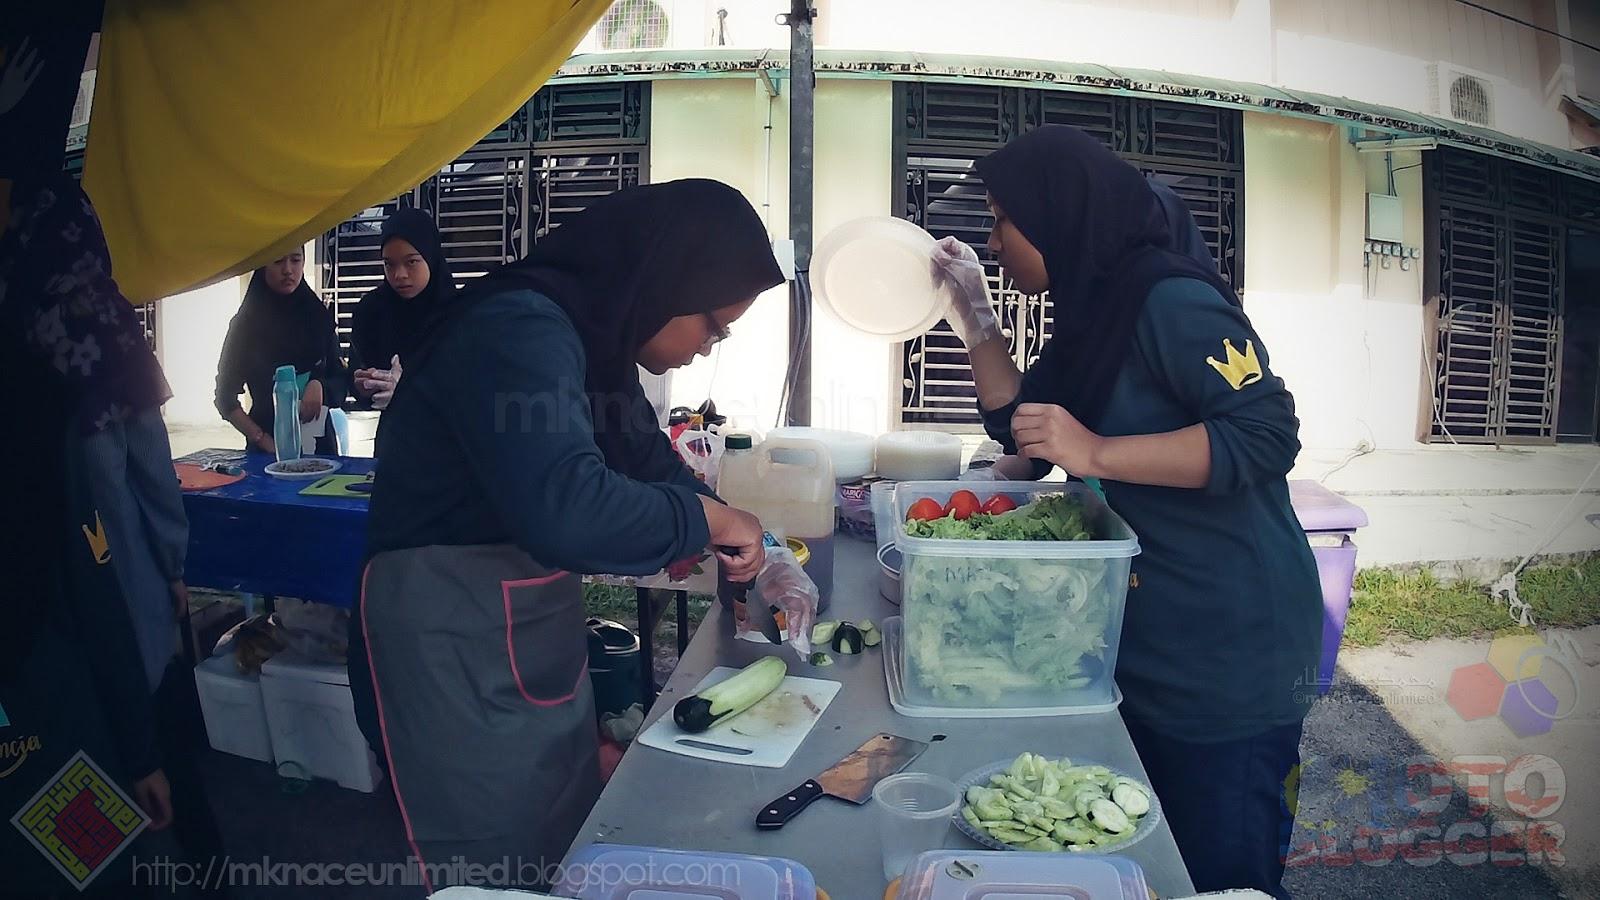 Sekolah Tun Fatimah 20181027 Questa Program Keusahawanan Roti Tissue By Canai Ikhwan Gh Corner Mks Bubur Ayam